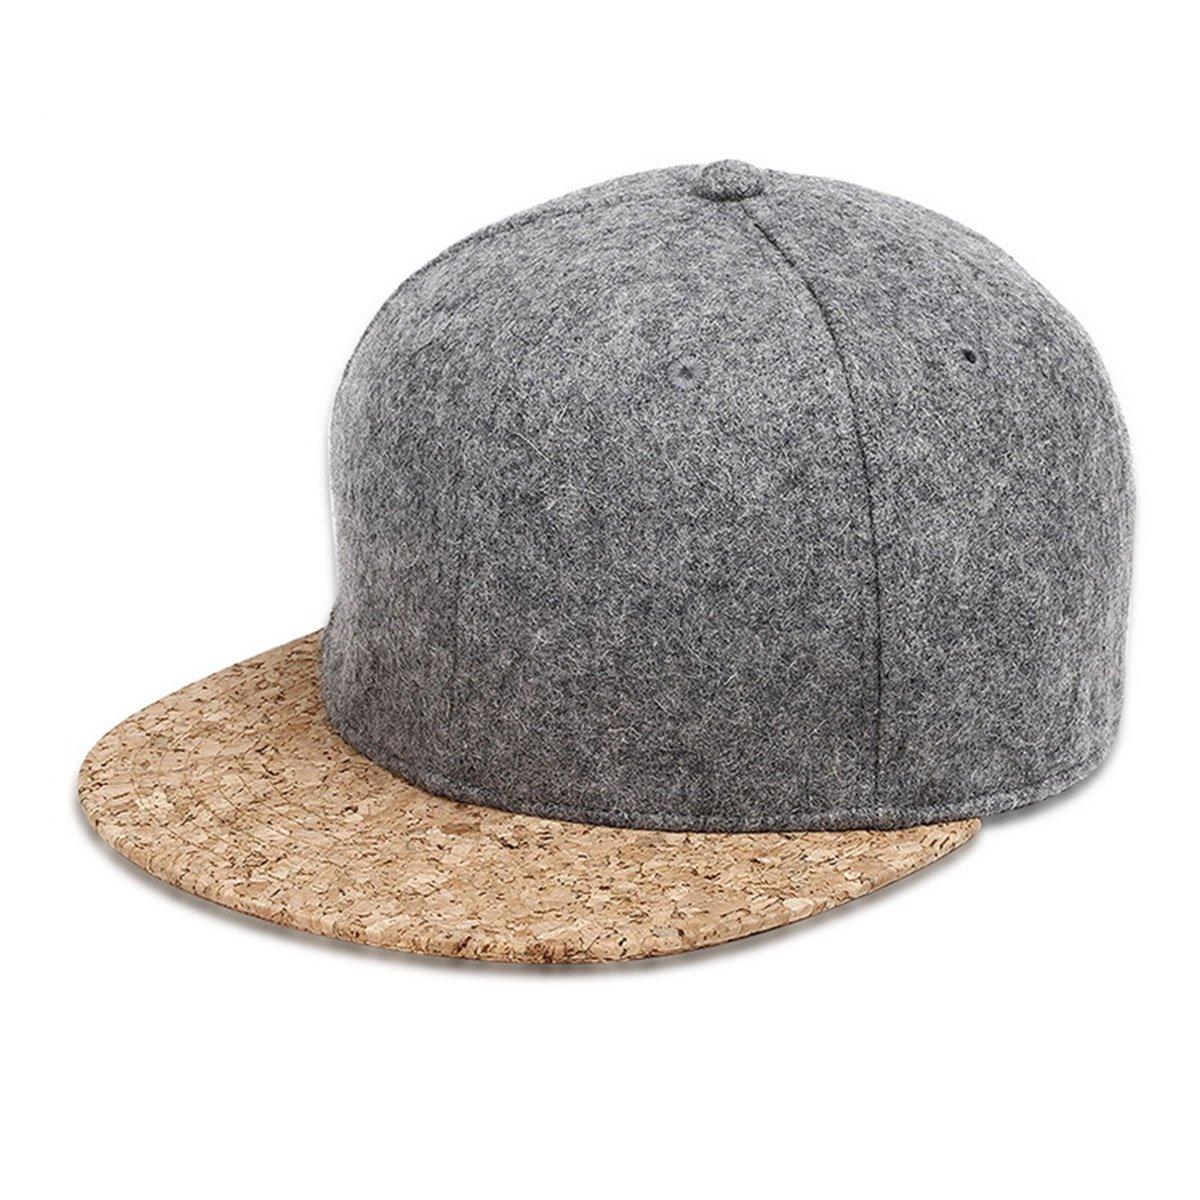 Jiele di lana berretto da baseball–-per uomini e donne regolabile visiera piatta berretto da baseball hip hop snapback b-boy, Light Grey